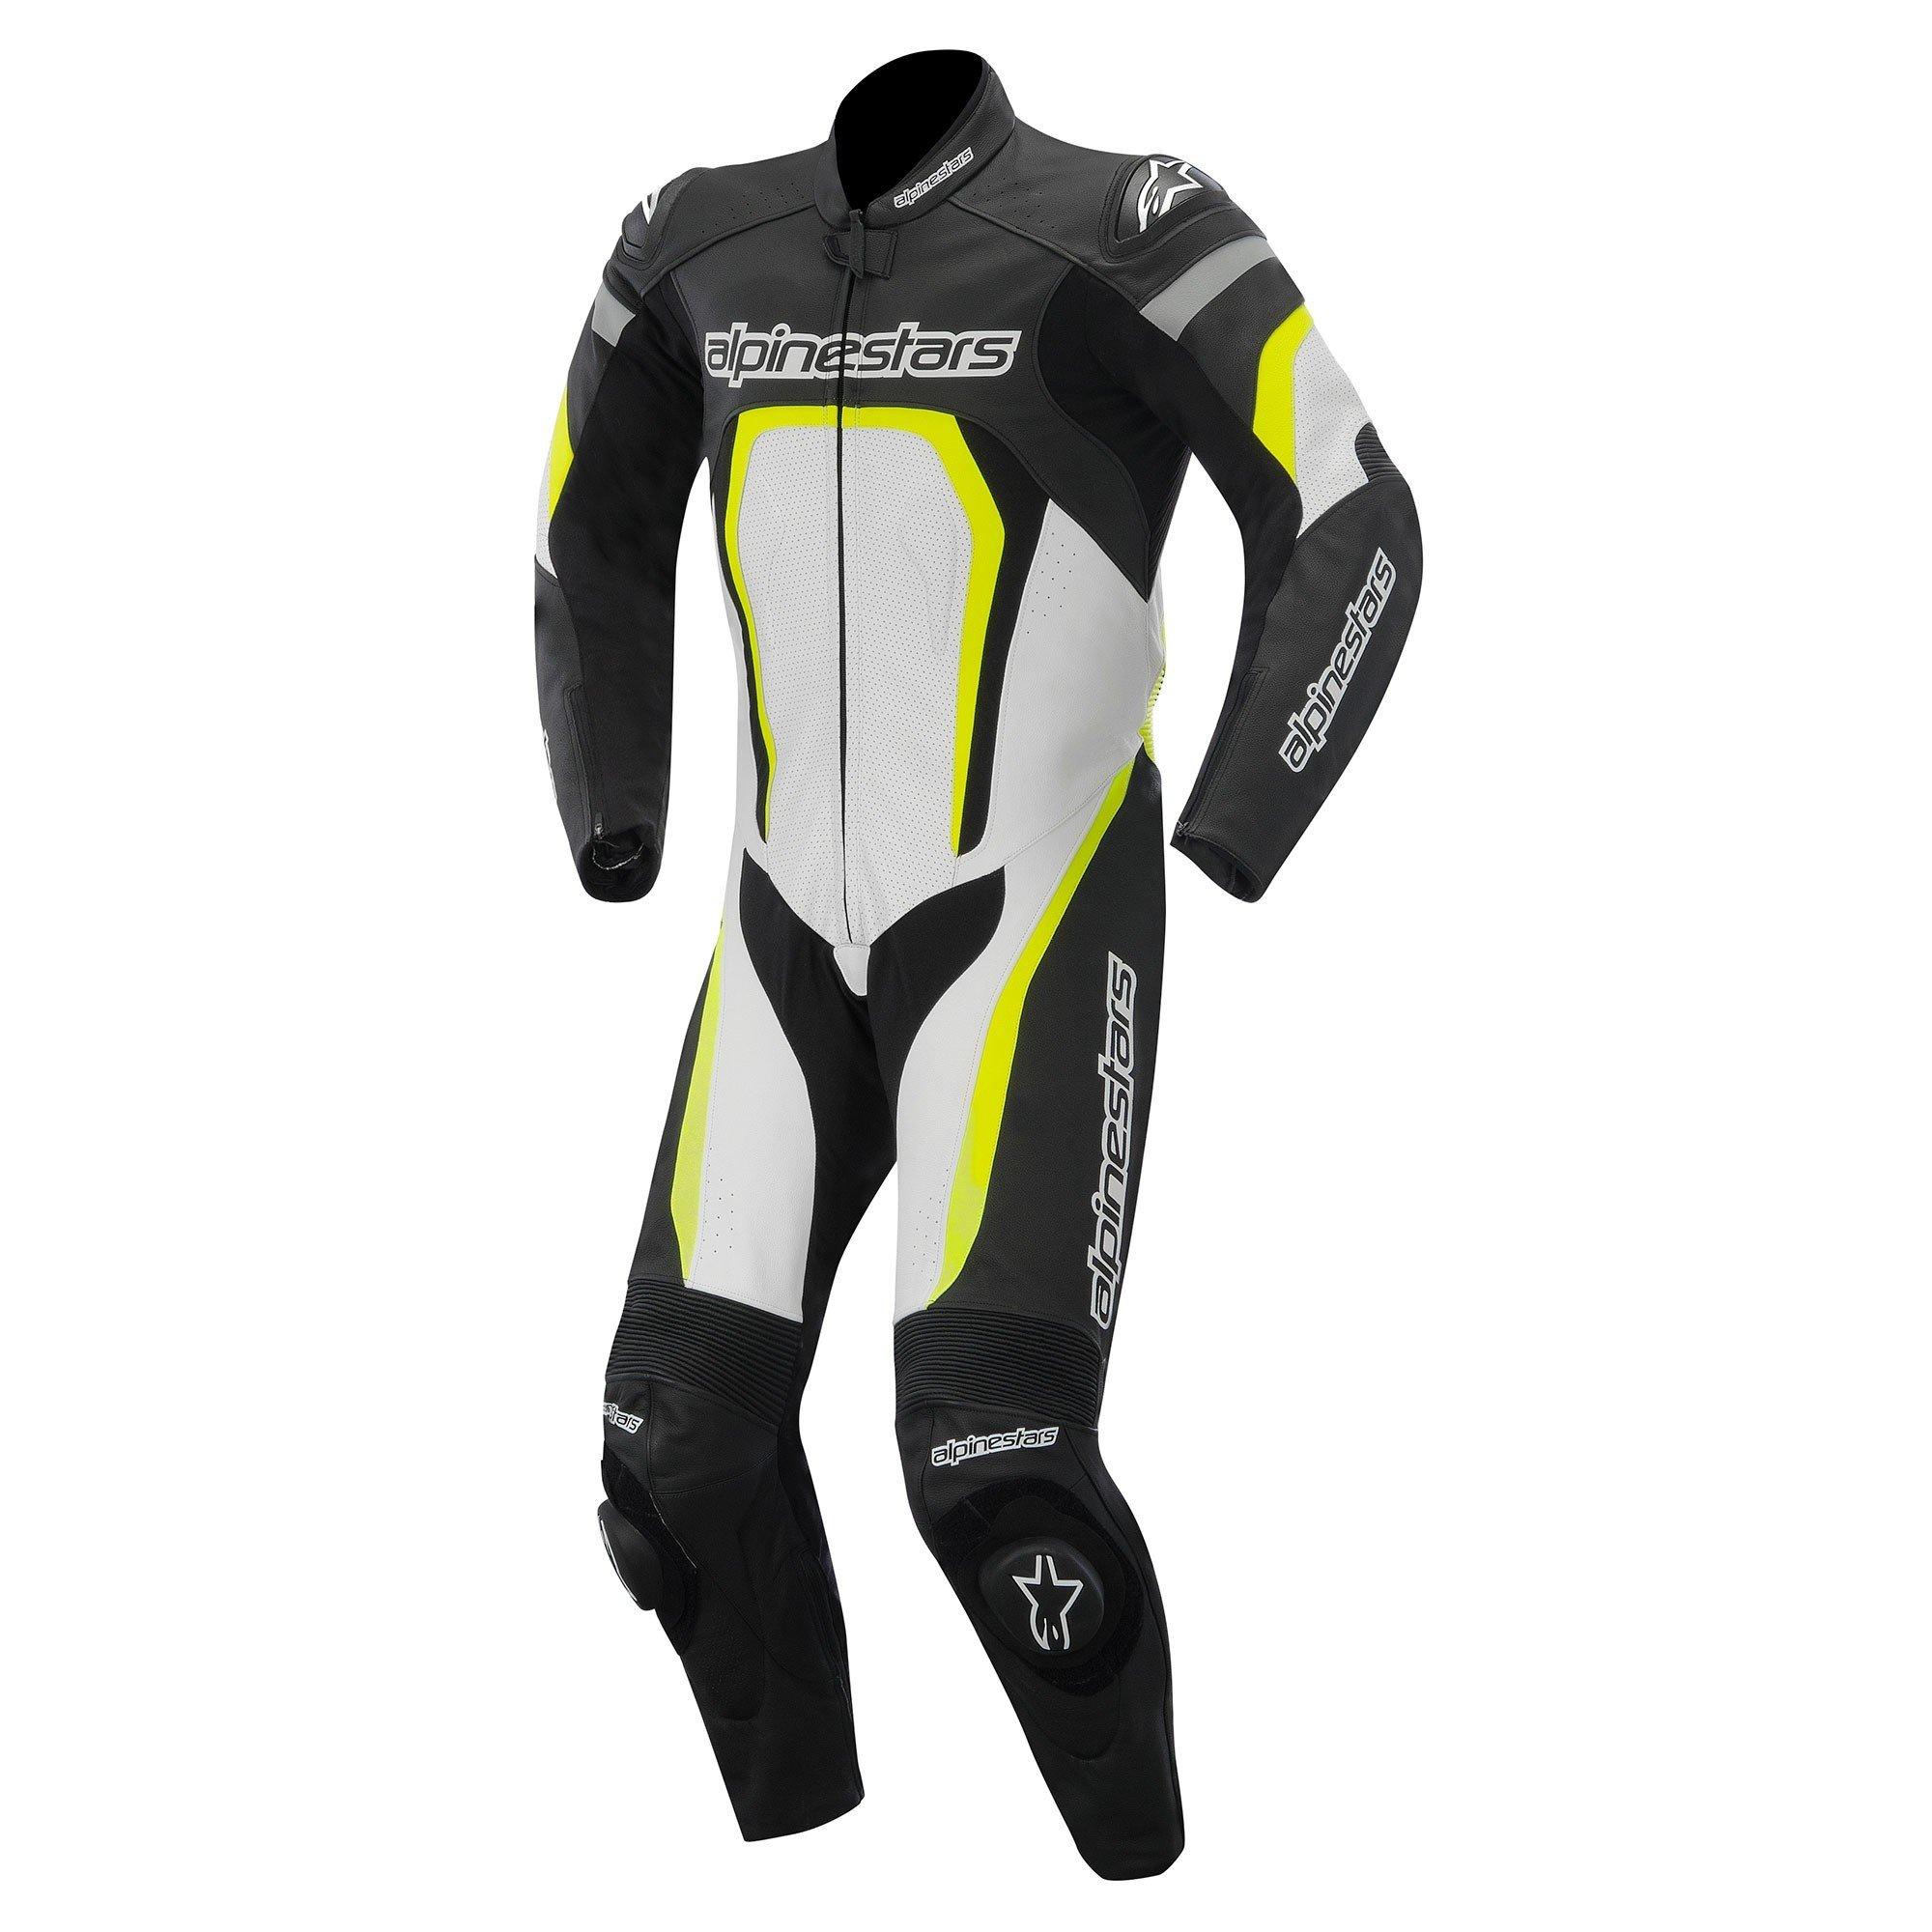 Alpinestars Motegi 1PC Suit Black/White/Yellow Fluo 48